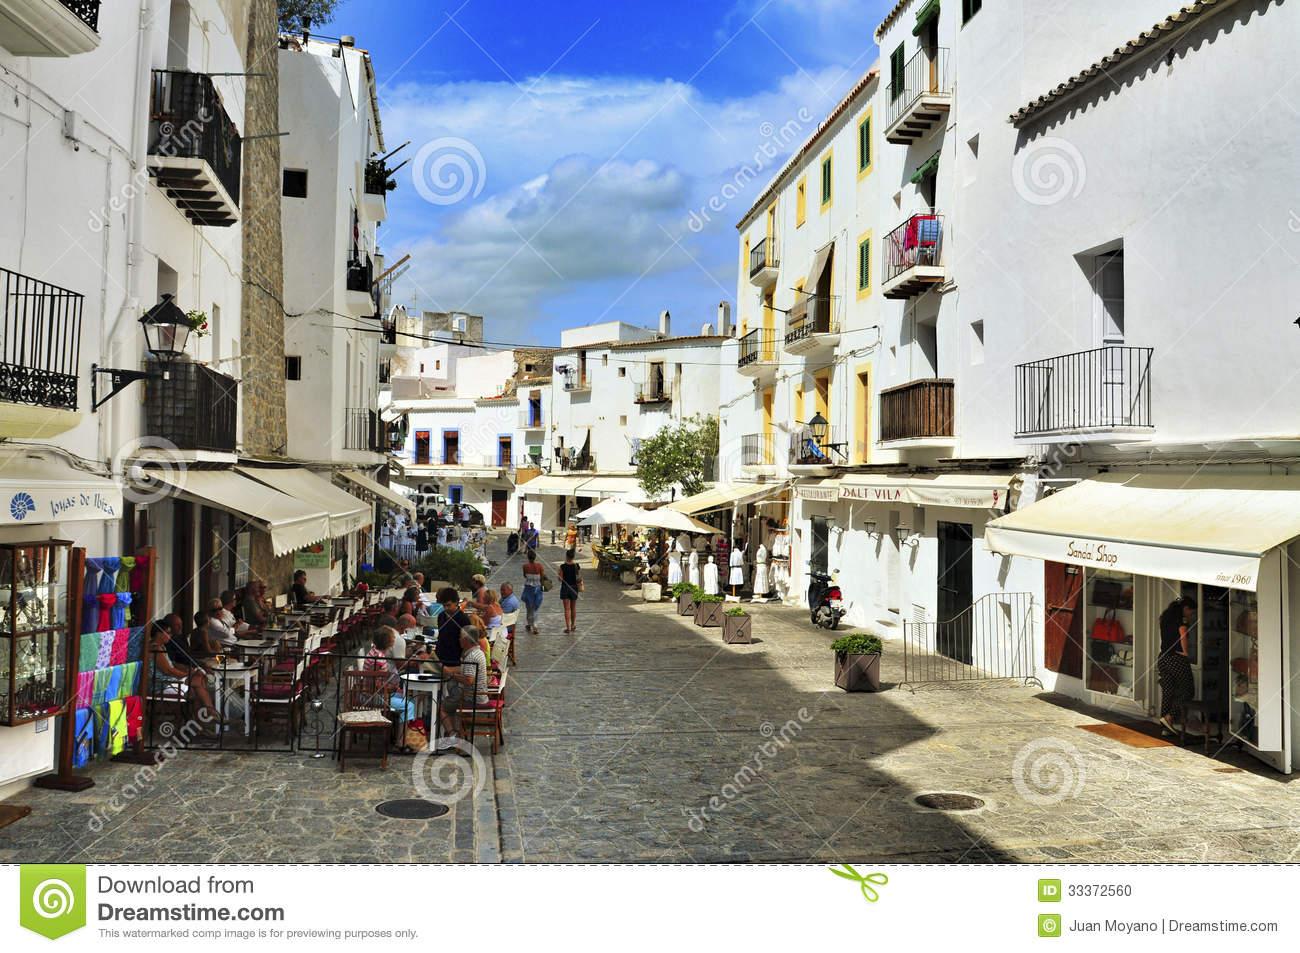 Dalt Vila, The Old Town Of Ibiza Town, In Balearic Islands, Spai.